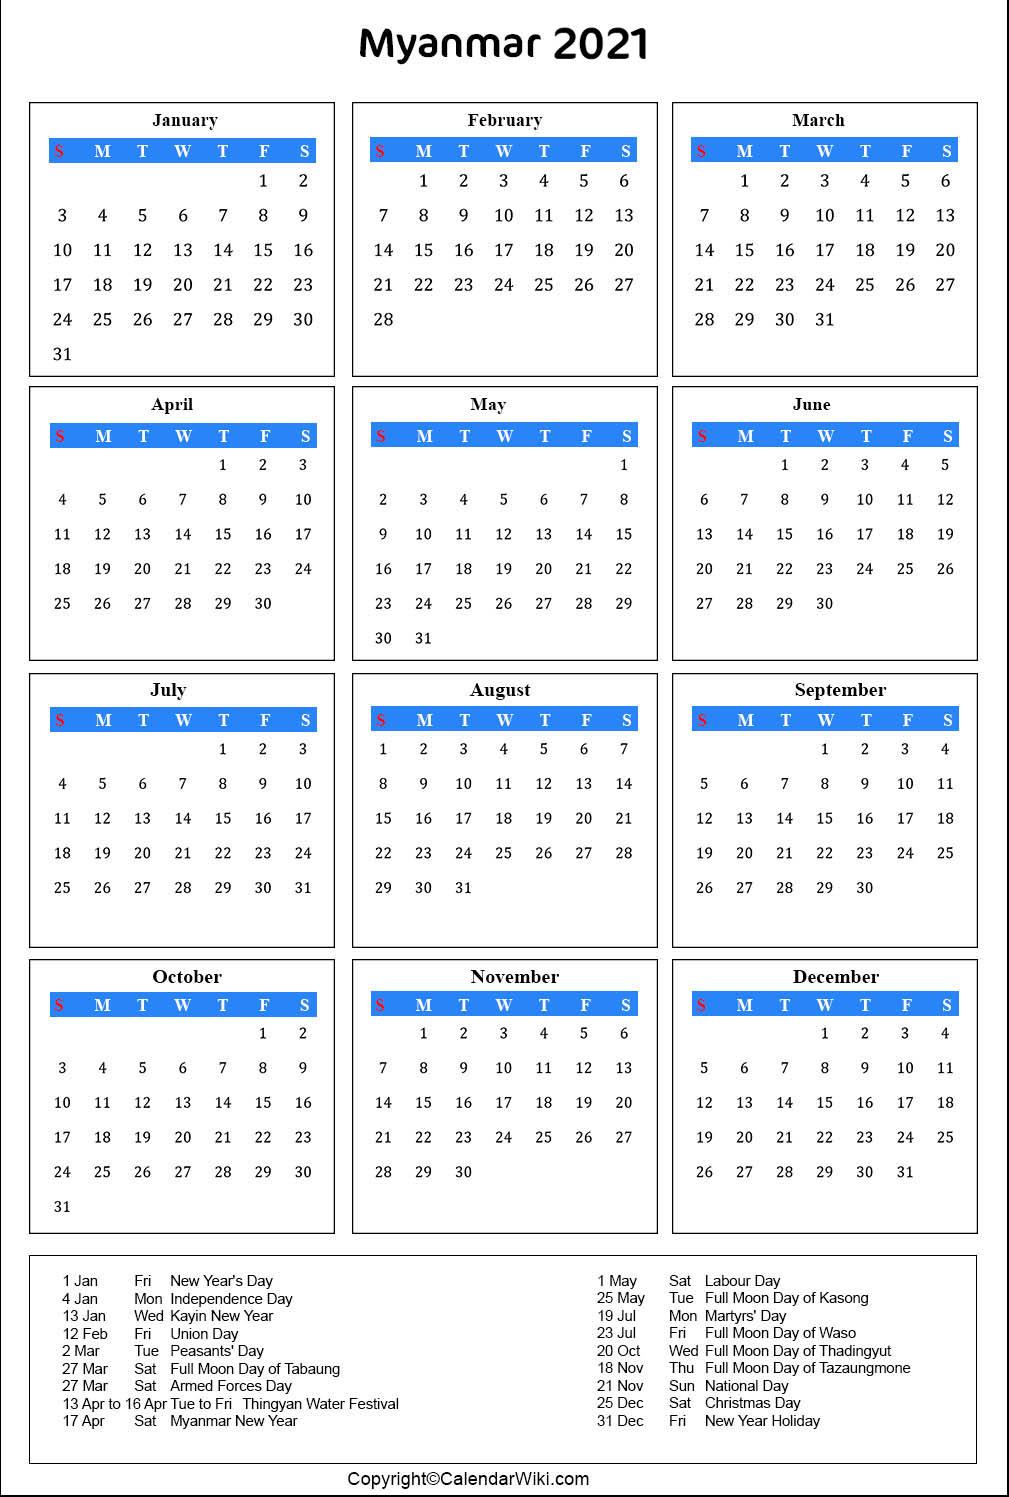 Printable Myanmar Calendar 2021 with Holidays [Public Holidays]